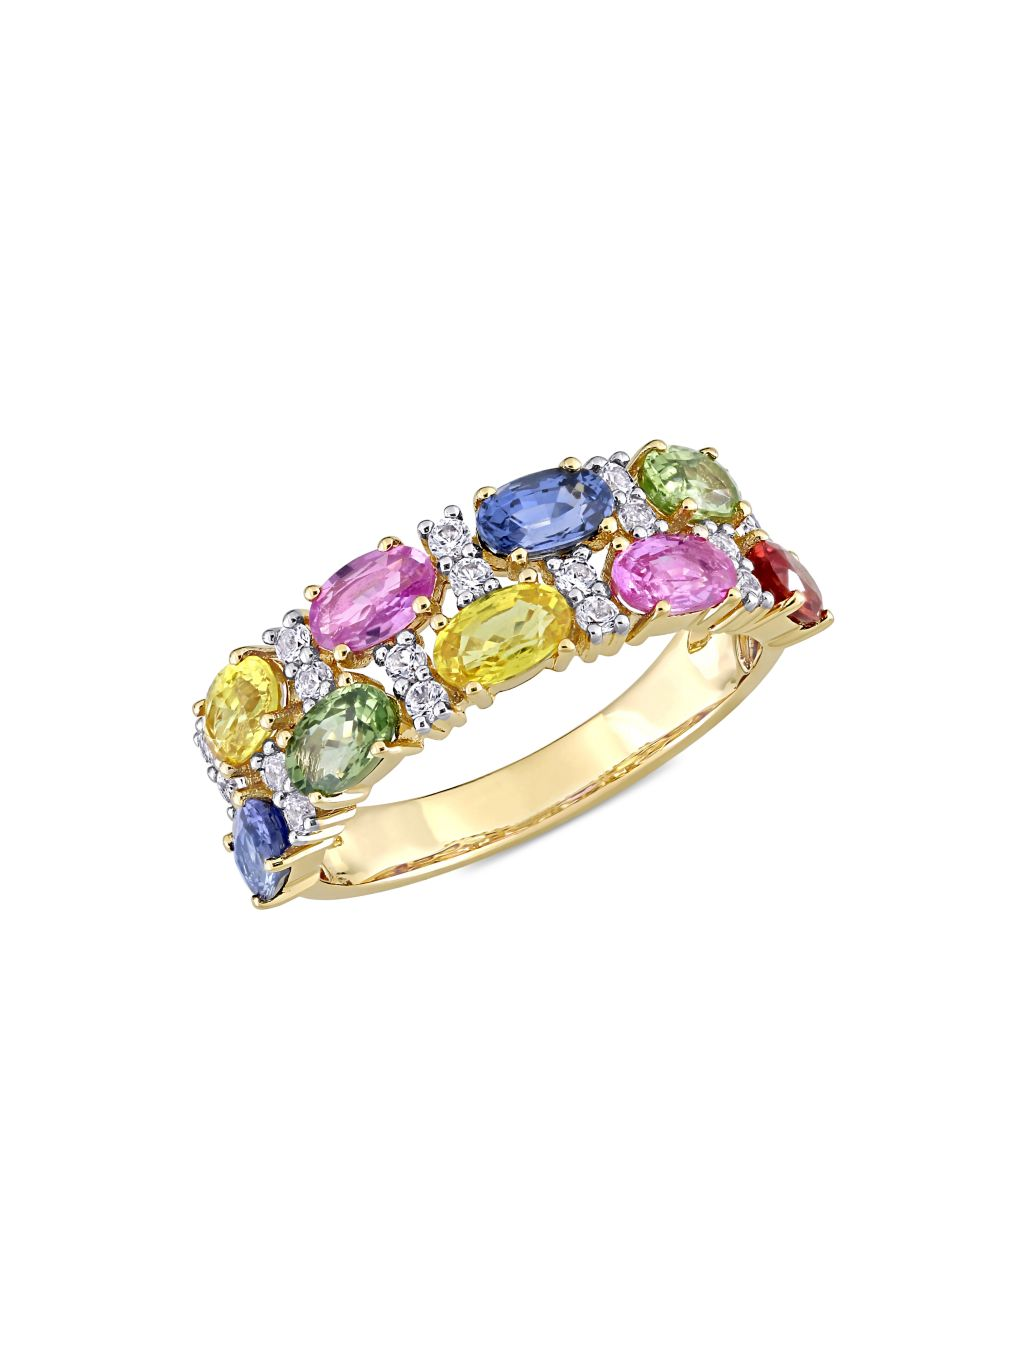 Sonatina 14K Yellow Gold & Multicolor Sapphire Ring